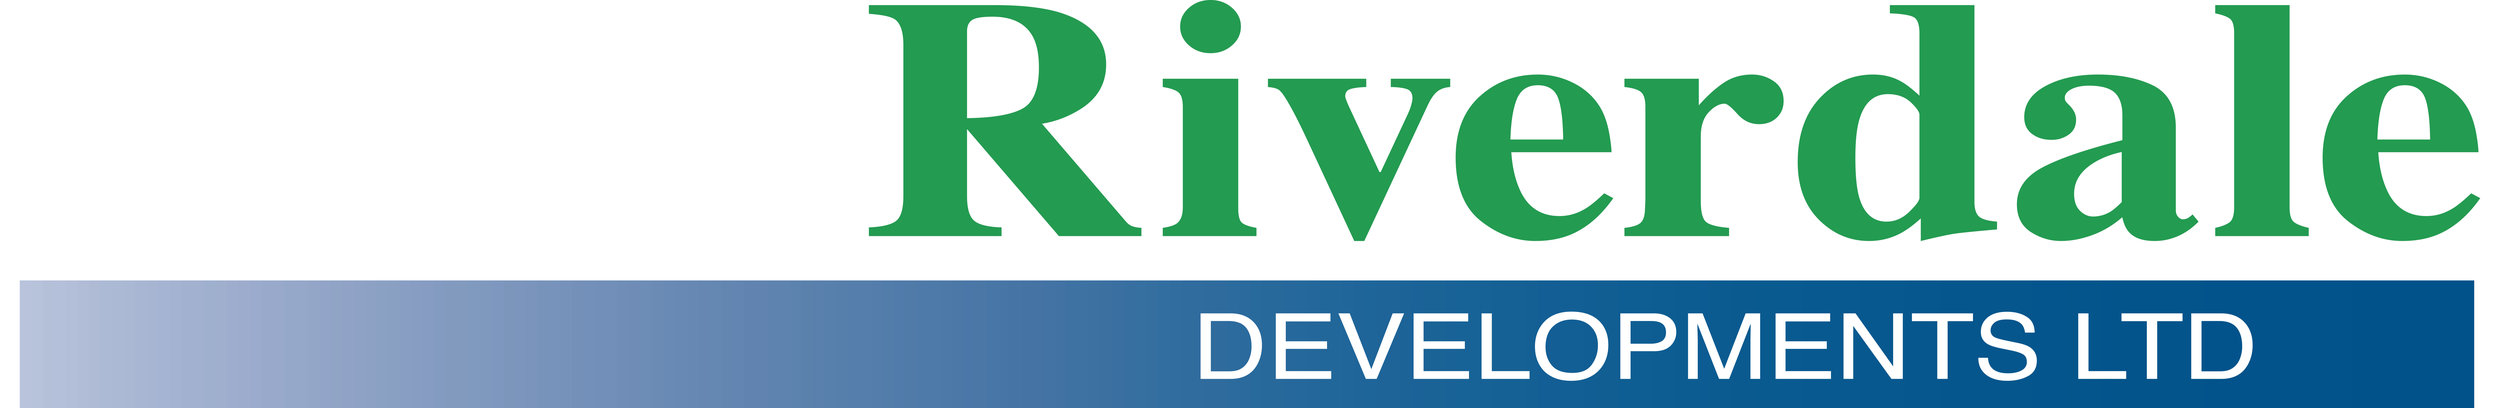 Riverdale-high-res-copy.jpg